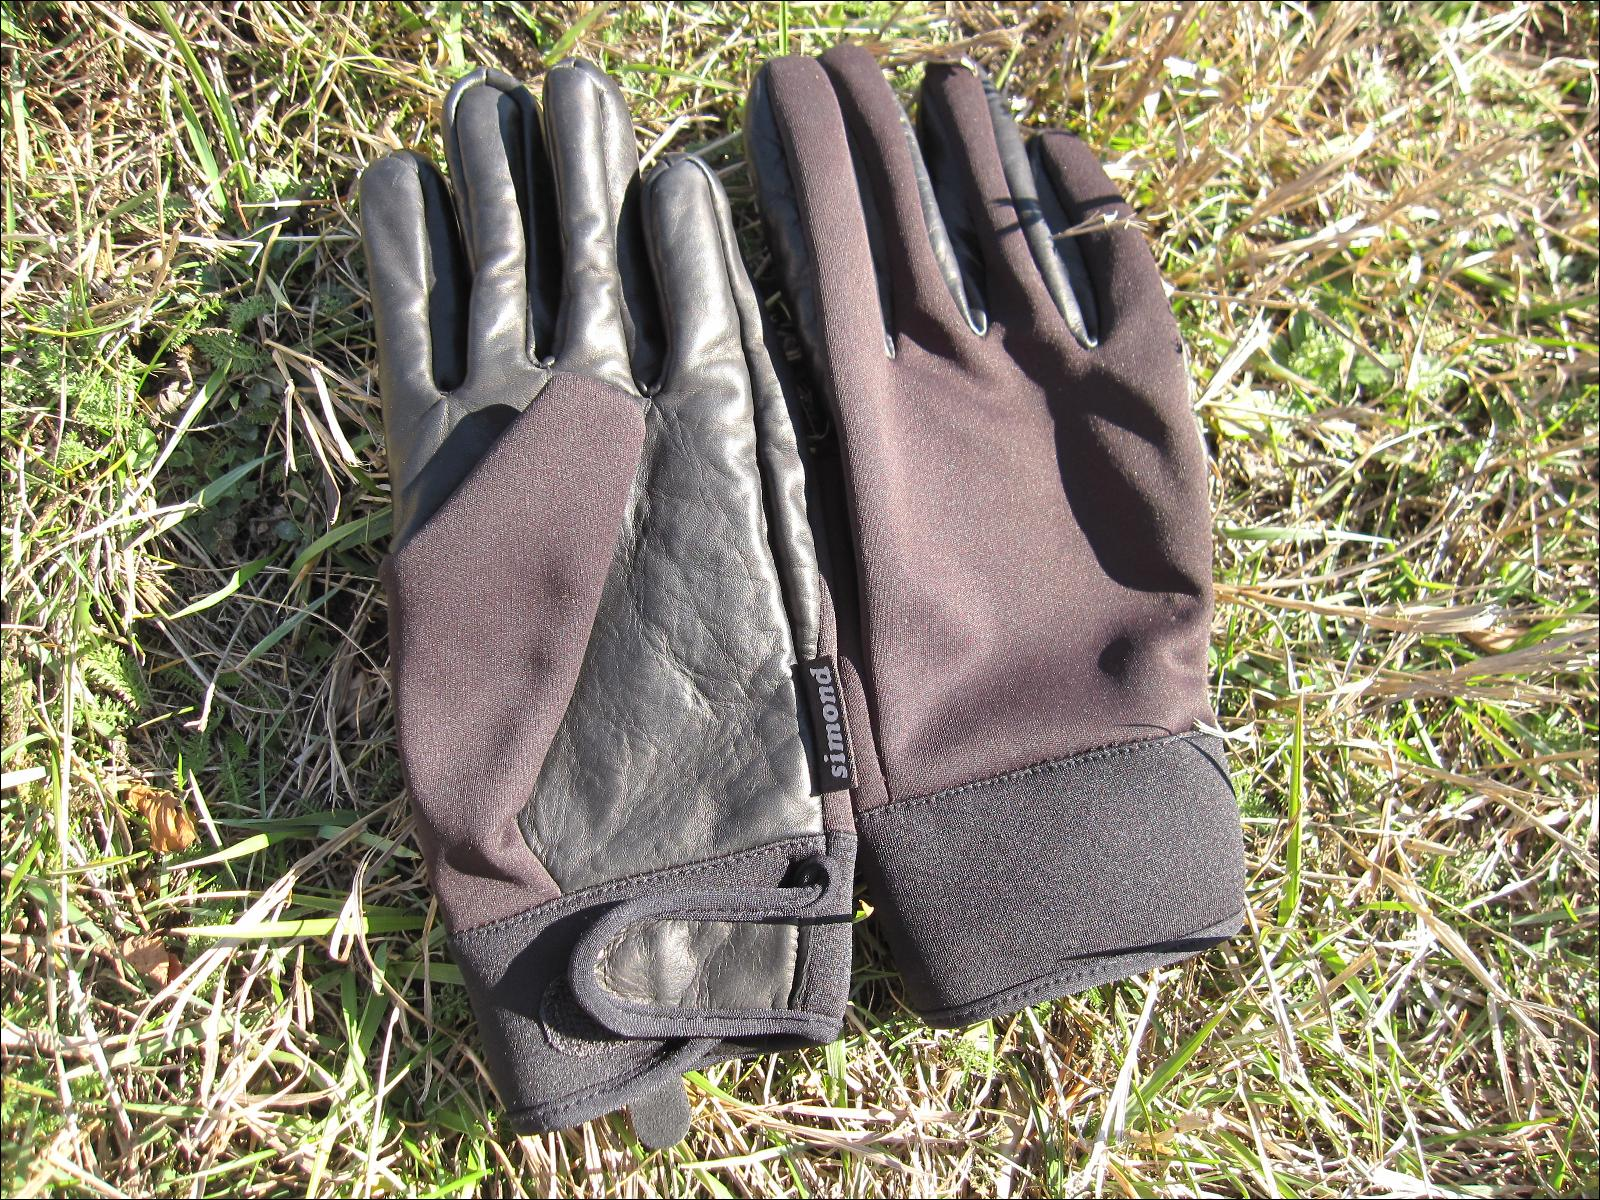 gants pour pas se geler les doigts en vol page 2. Black Bedroom Furniture Sets. Home Design Ideas